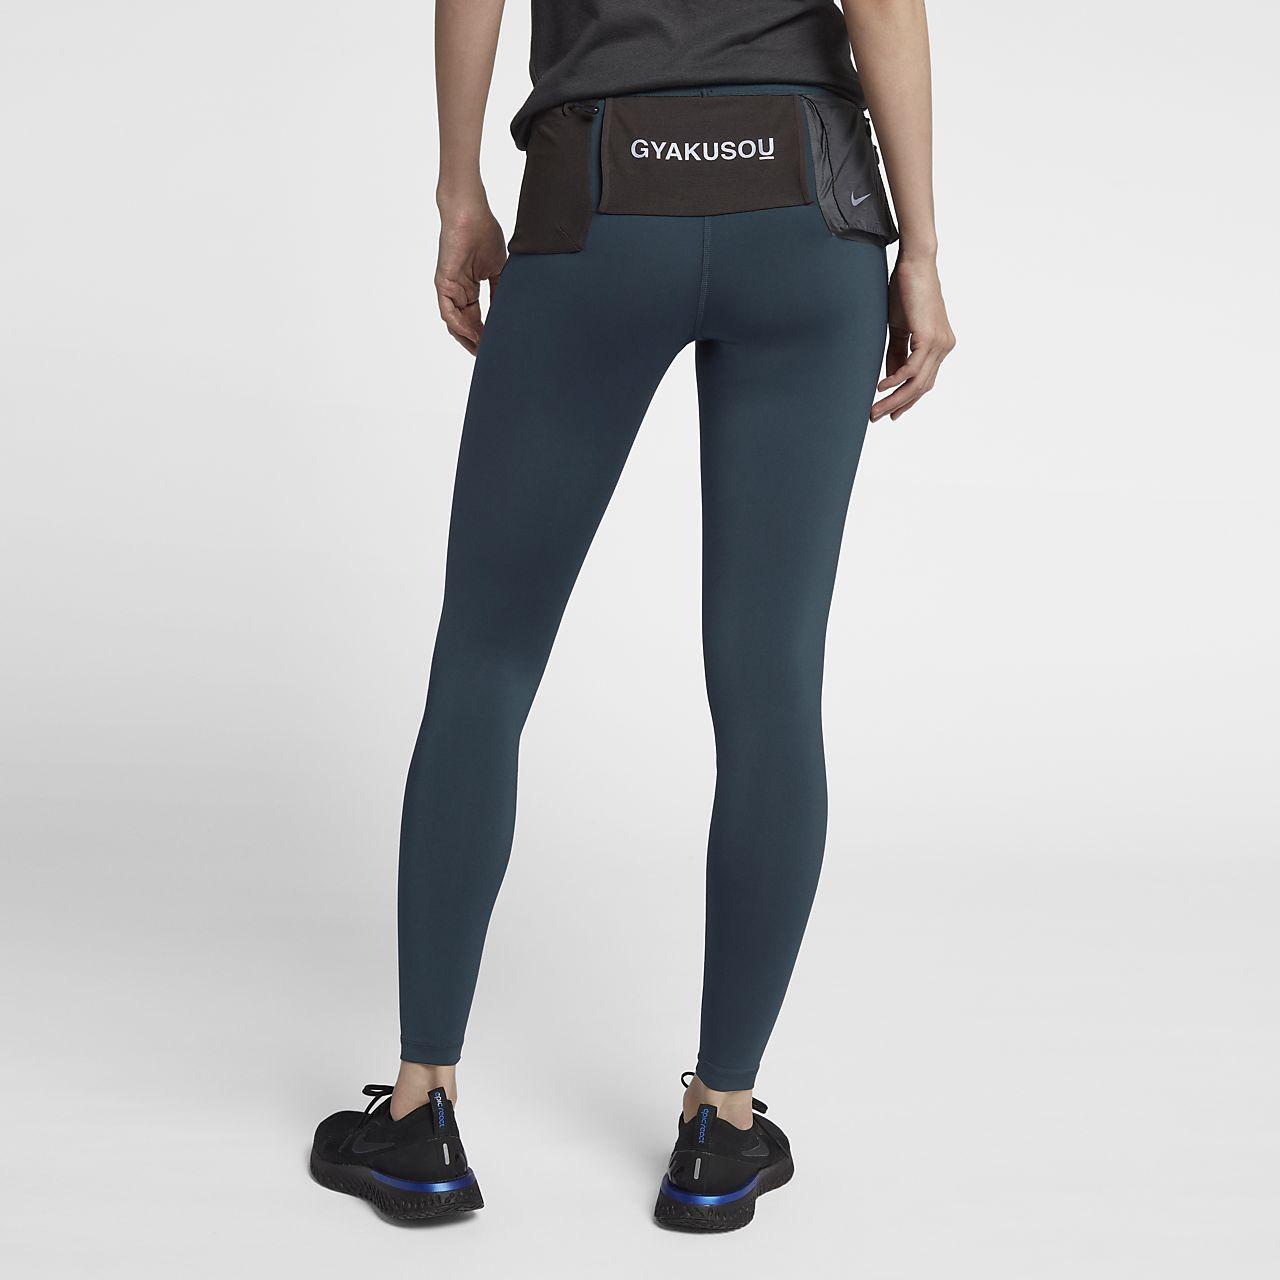 Nike Gyakusou Women's Utility Tights